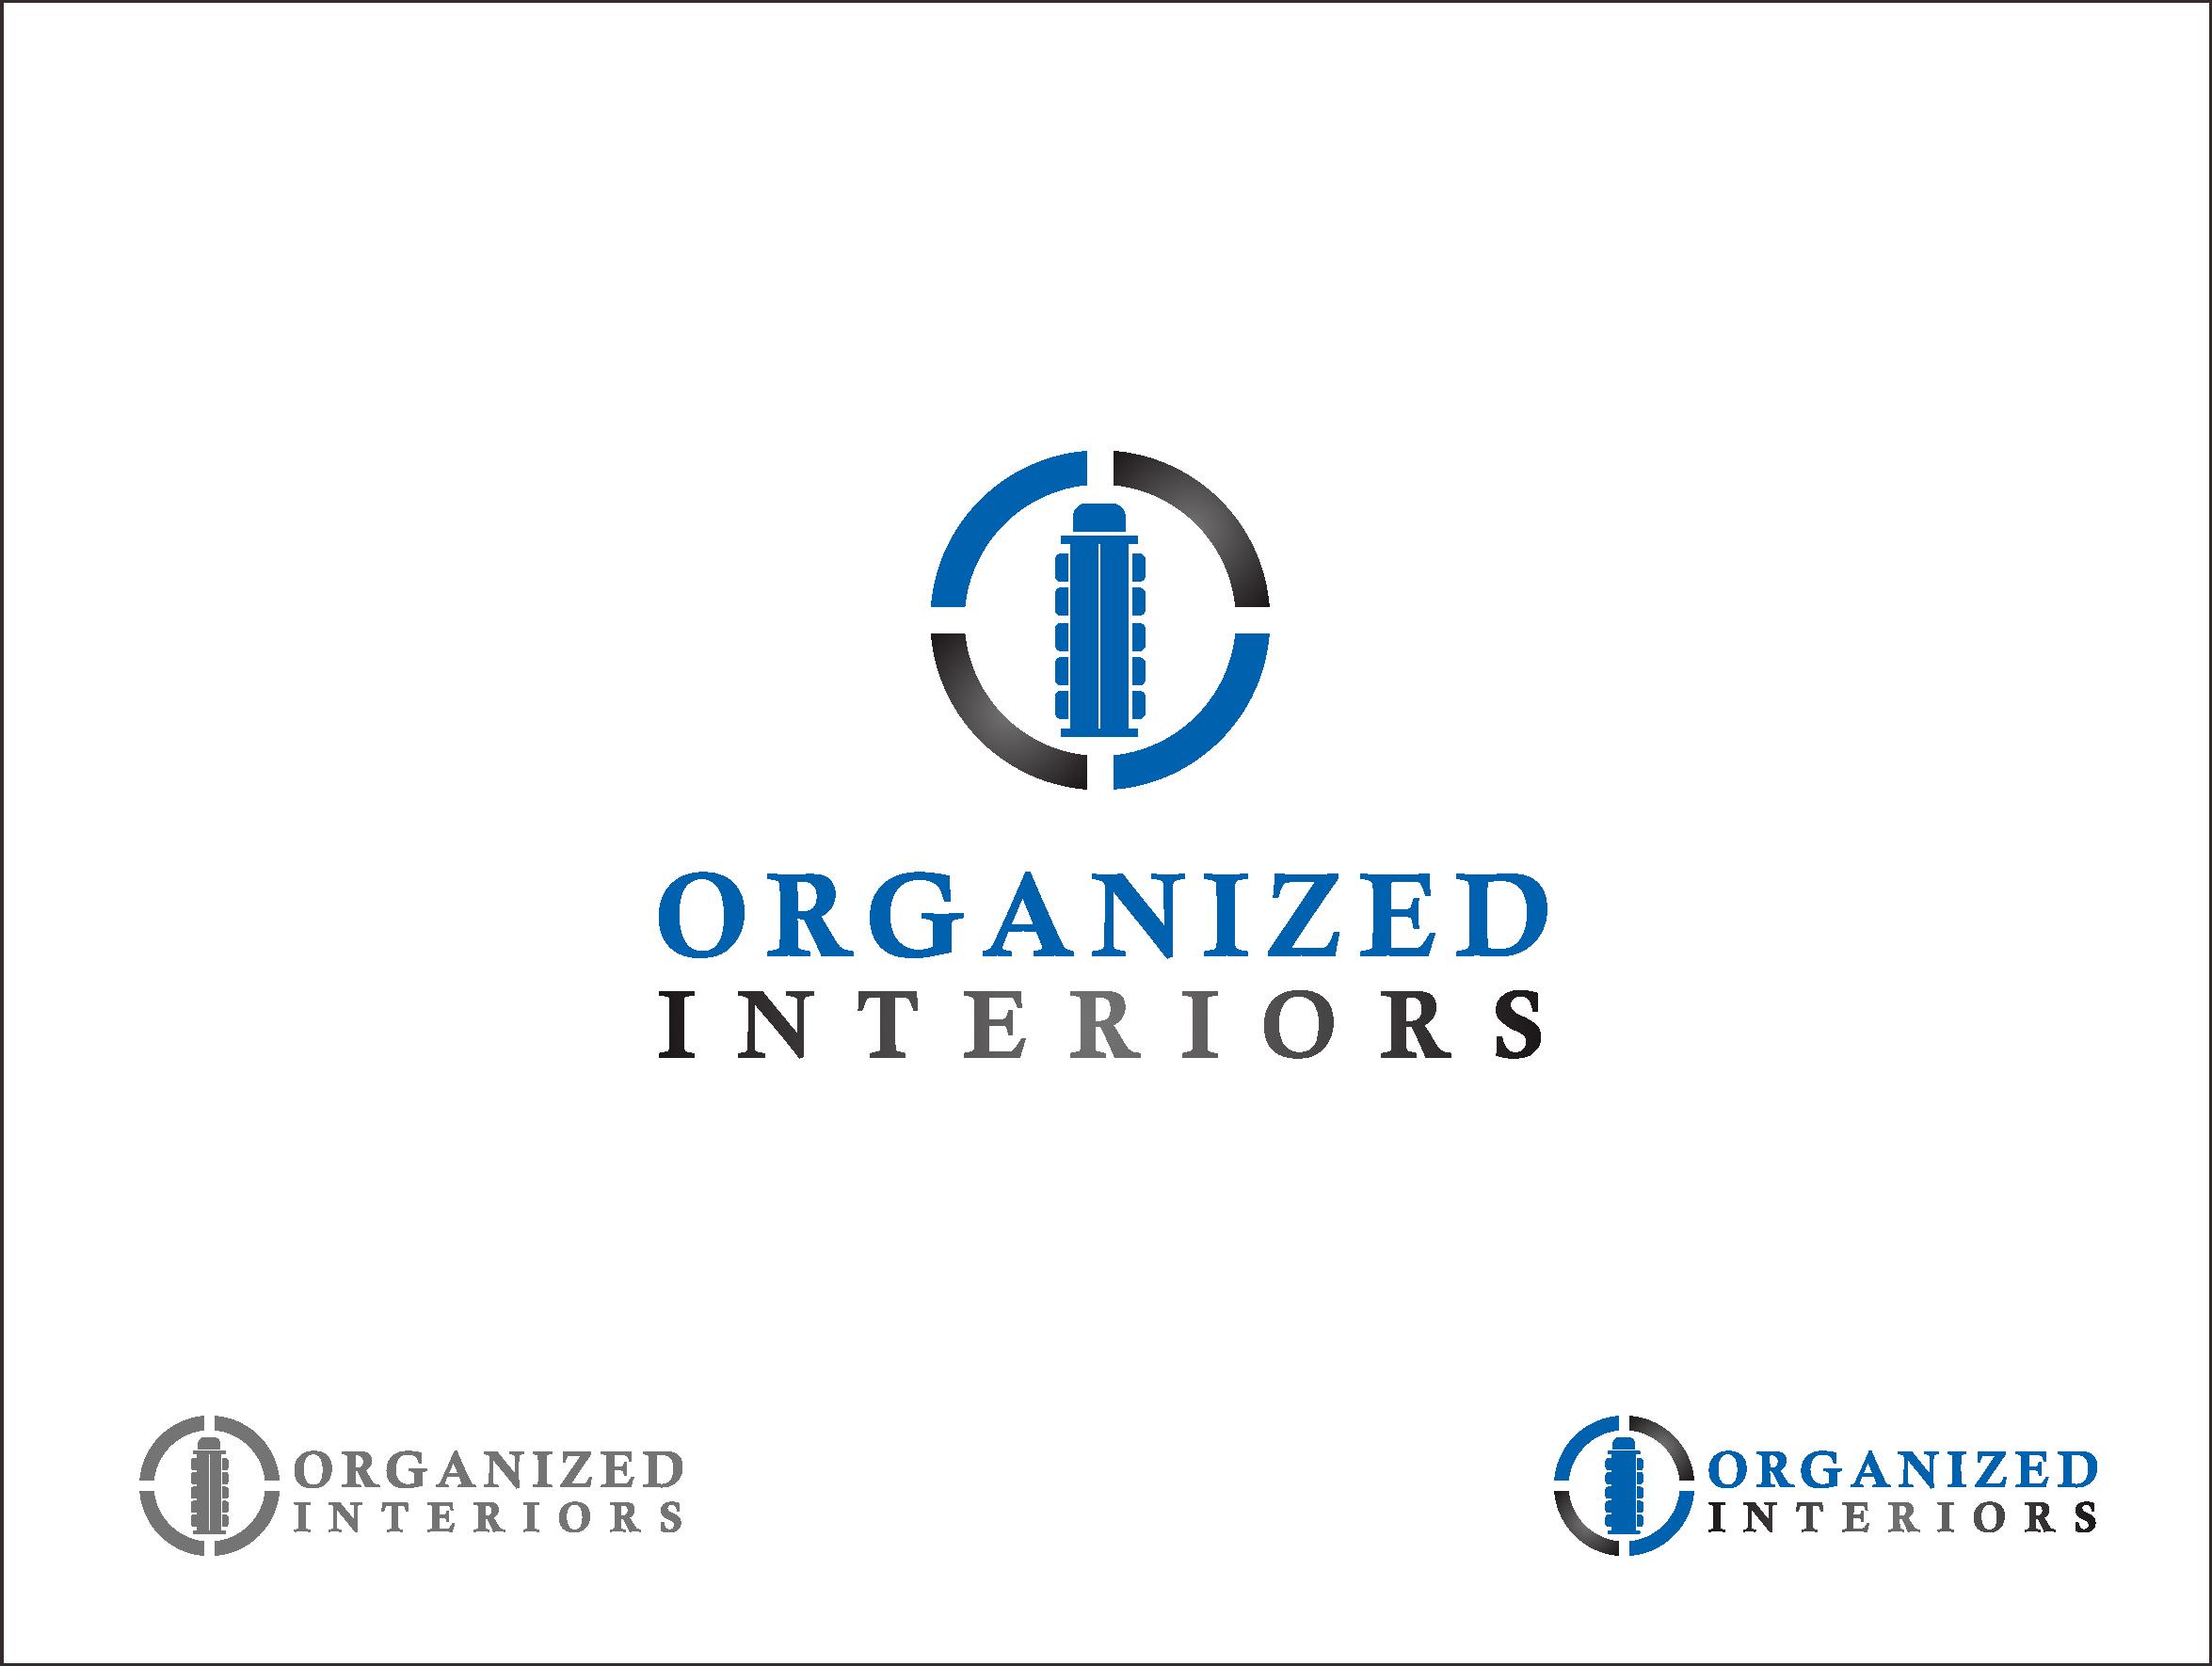 Logo Design by Armada Jamaluddin - Entry No. 46 in the Logo Design Contest Imaginative Logo Design for Organized Interiors.